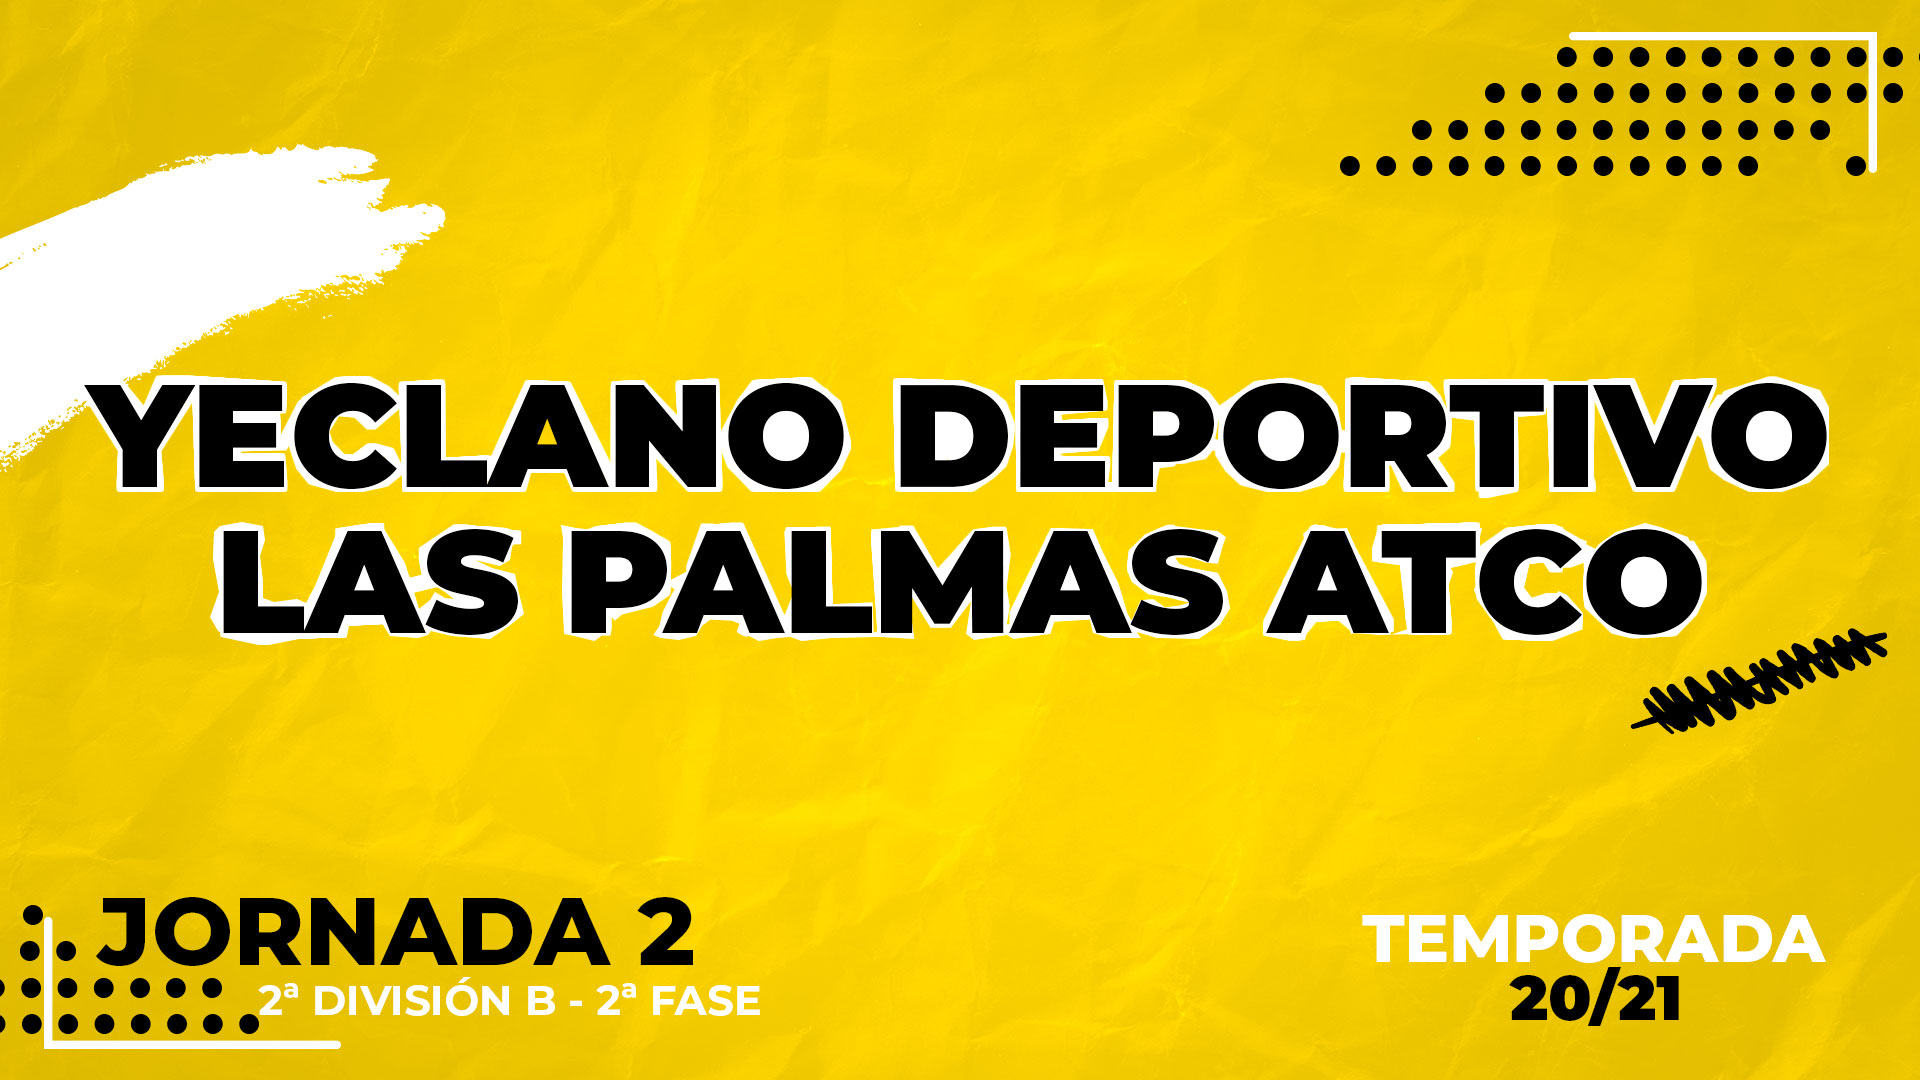 Yeclano vs Las Palmas Atlético